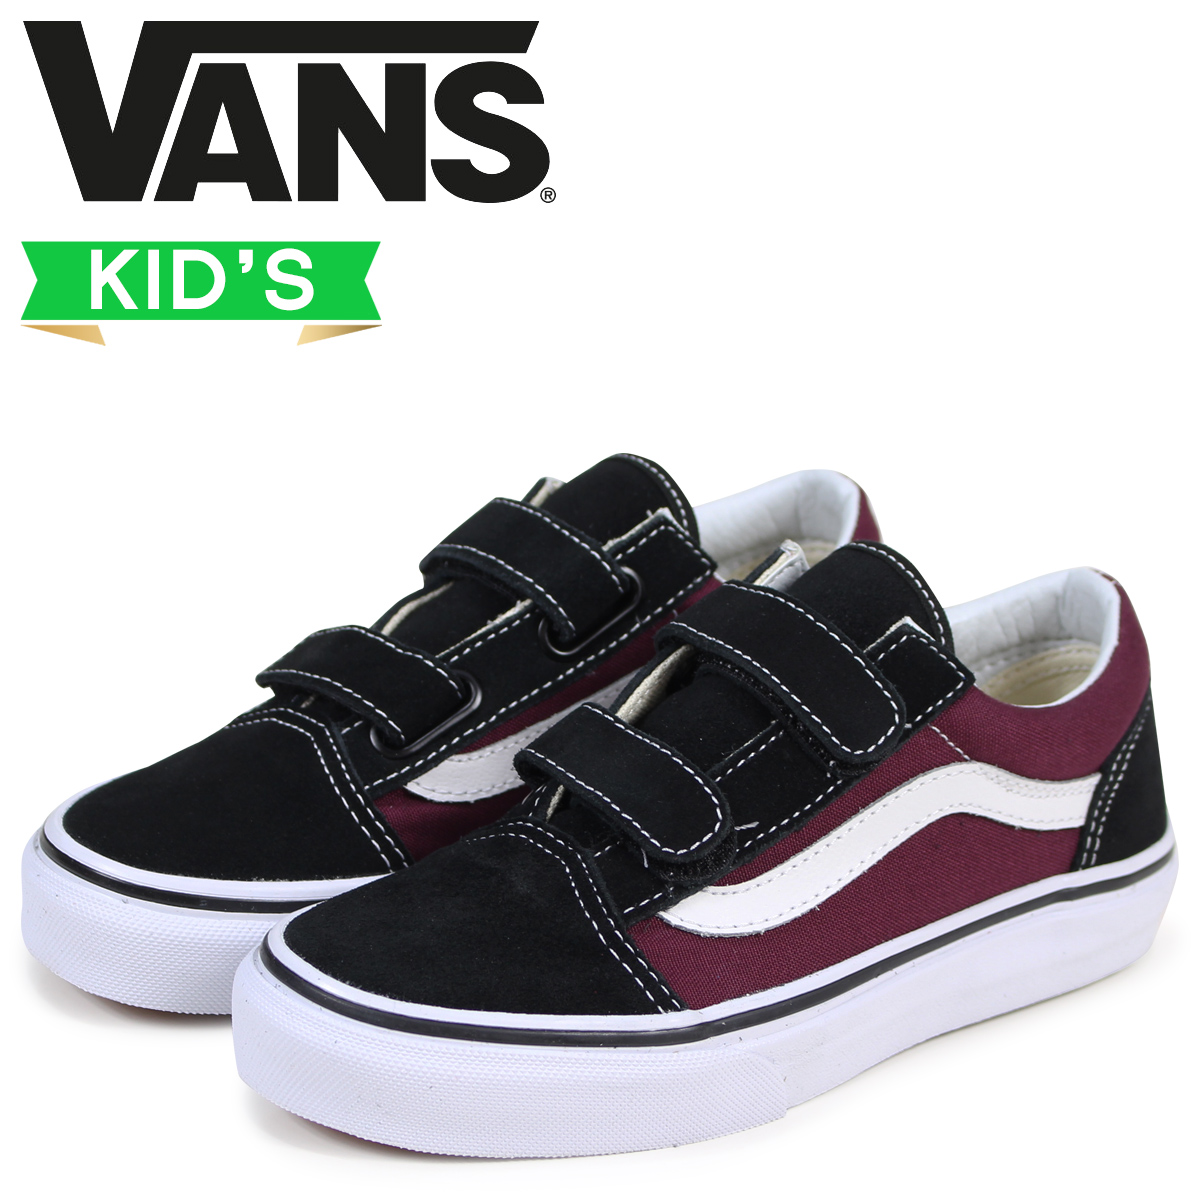 fe3941fae24 Sugar Online Shop  Vans old school kids sneakers VANS station wagons OLD  SKOOL V VN0A38HDQ7J black  3 15 Shinnyu load